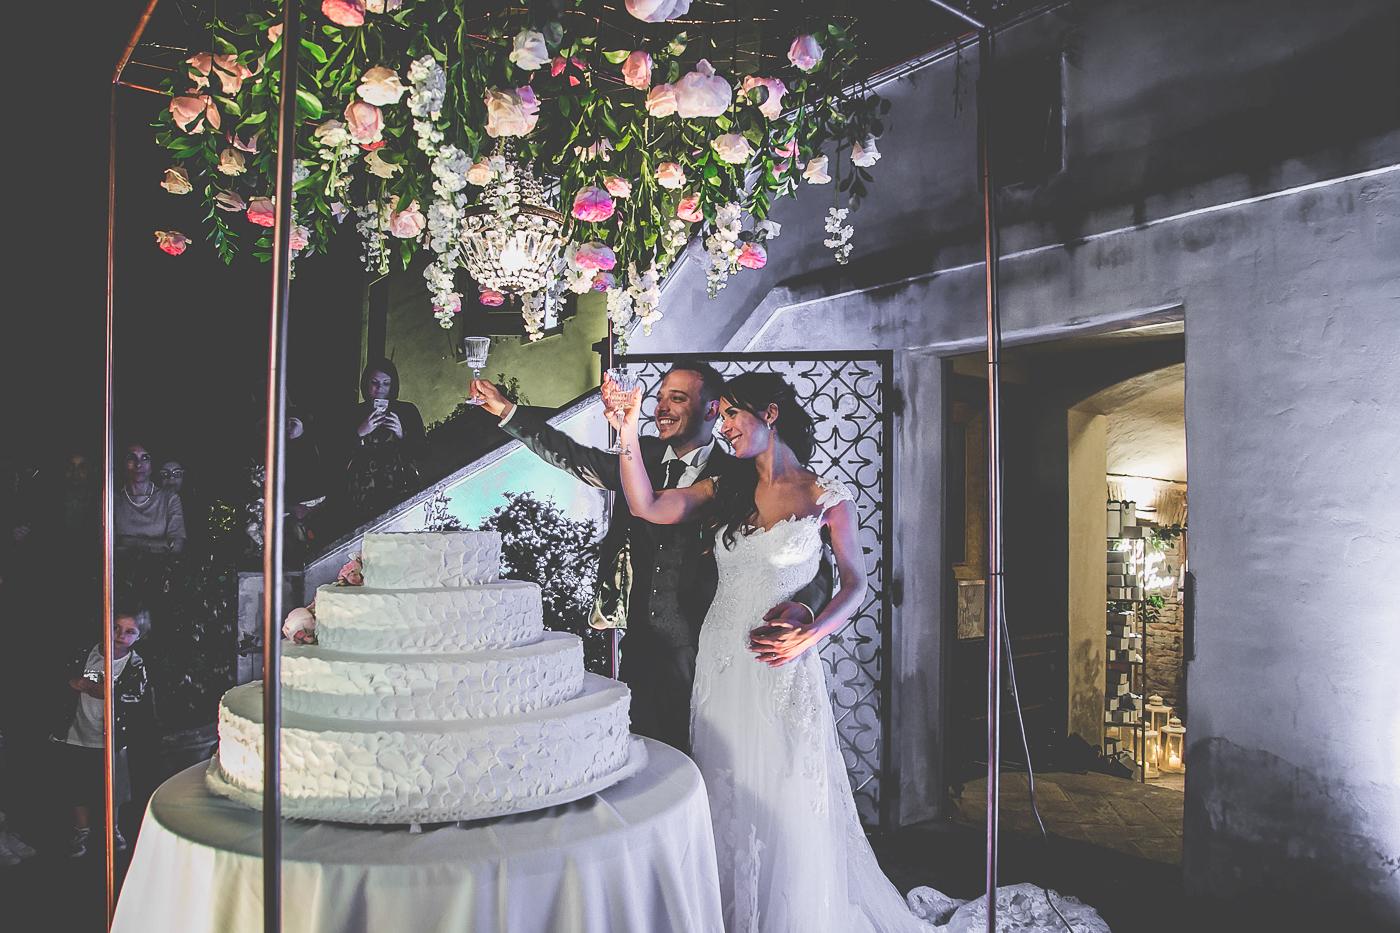 matrimonio elegante, matrimonio in villa, matrimonio in emilia romagna, wedding cutting cake inspiration, italian wedding inspiration, taglio torta elgante, astonishing cutting cake